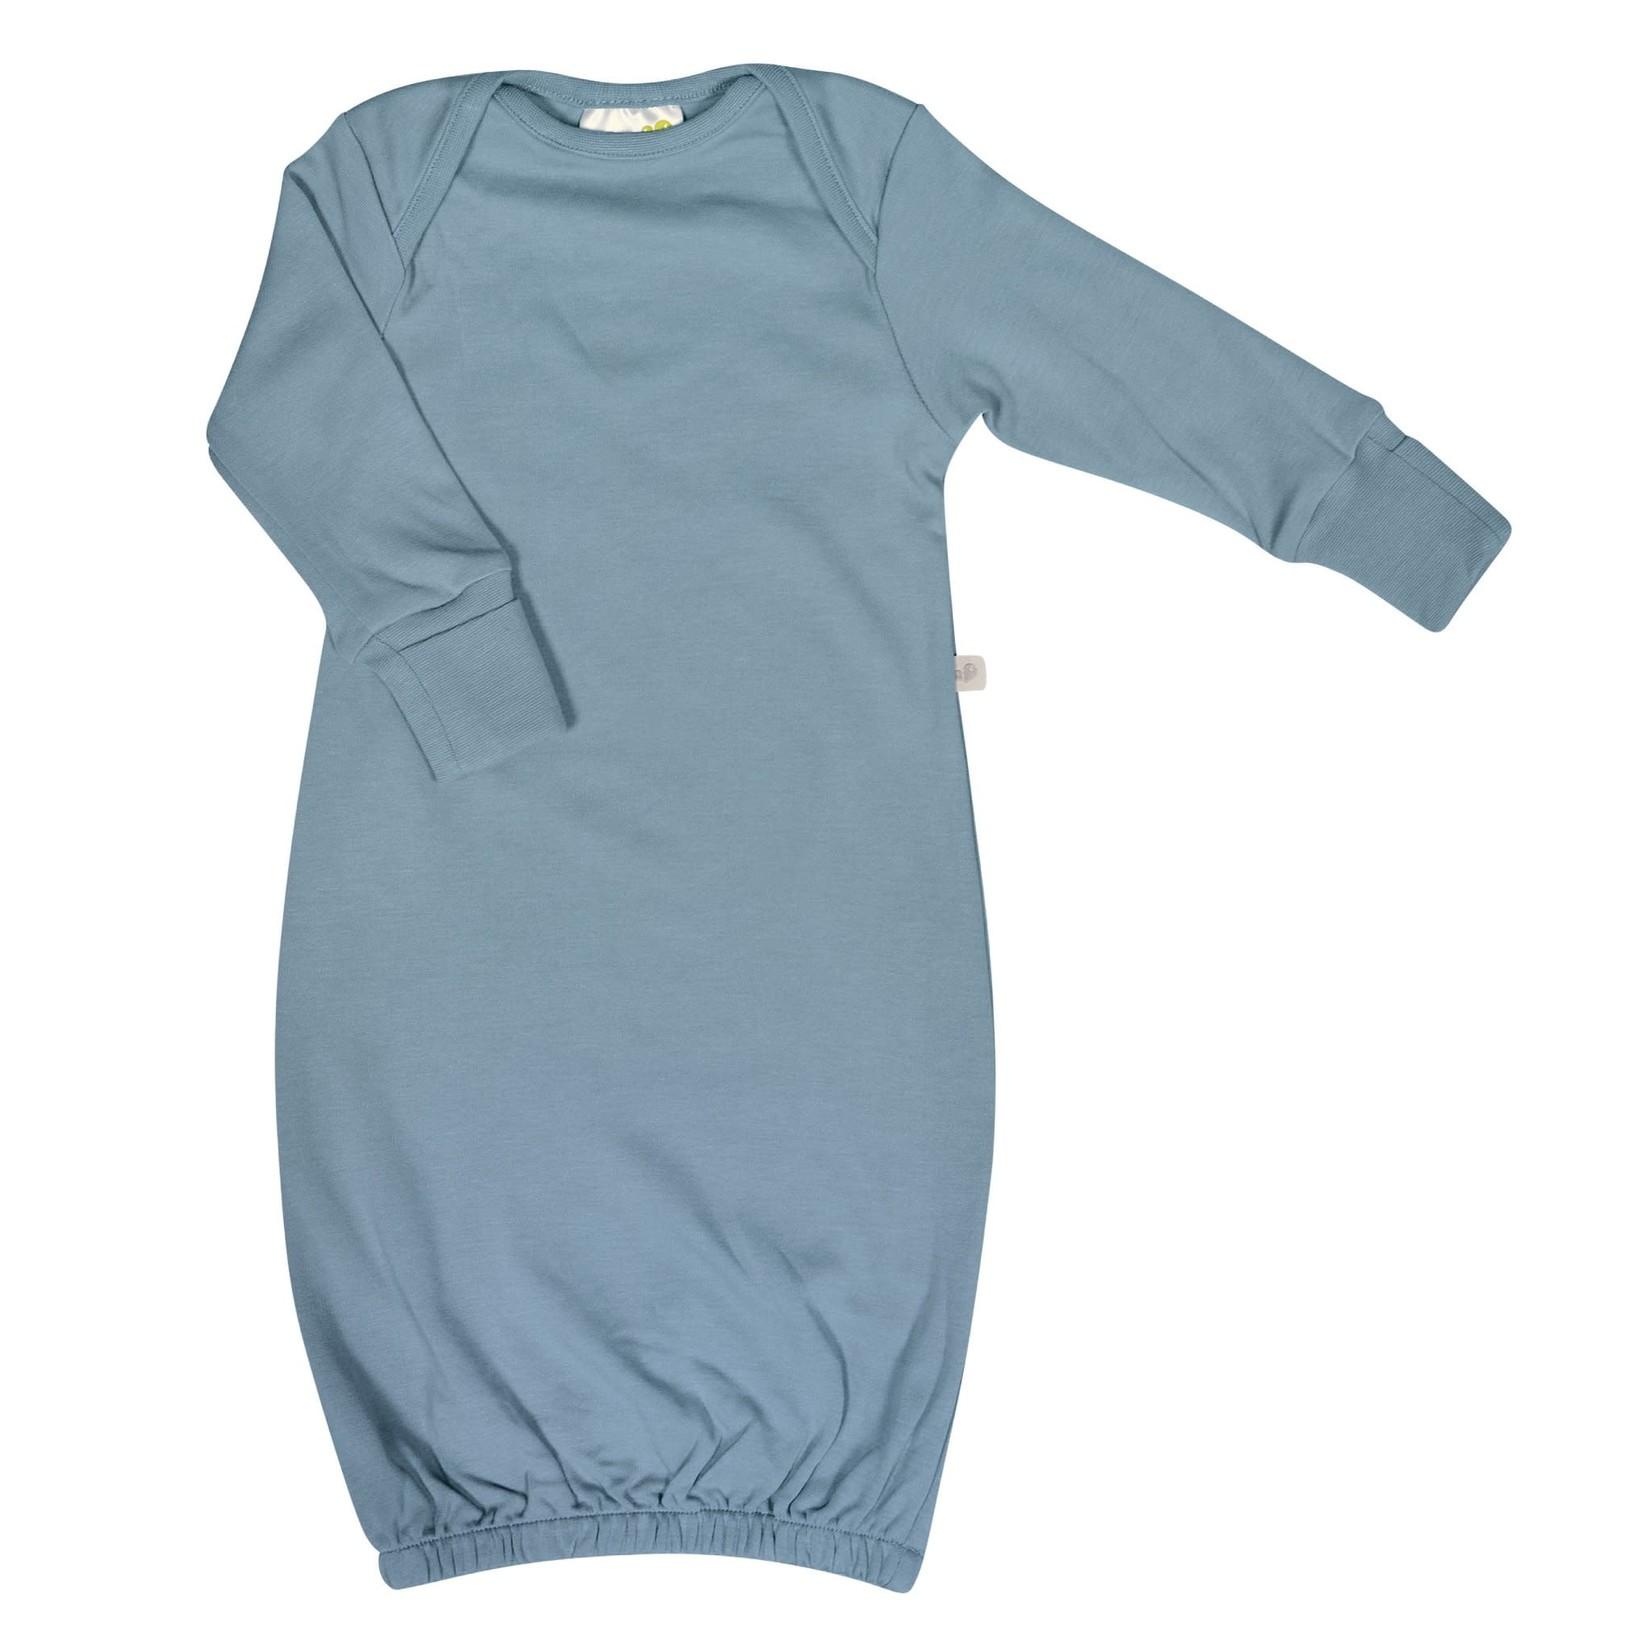 Bamboo Nightgown - Steel Blue - Newborn